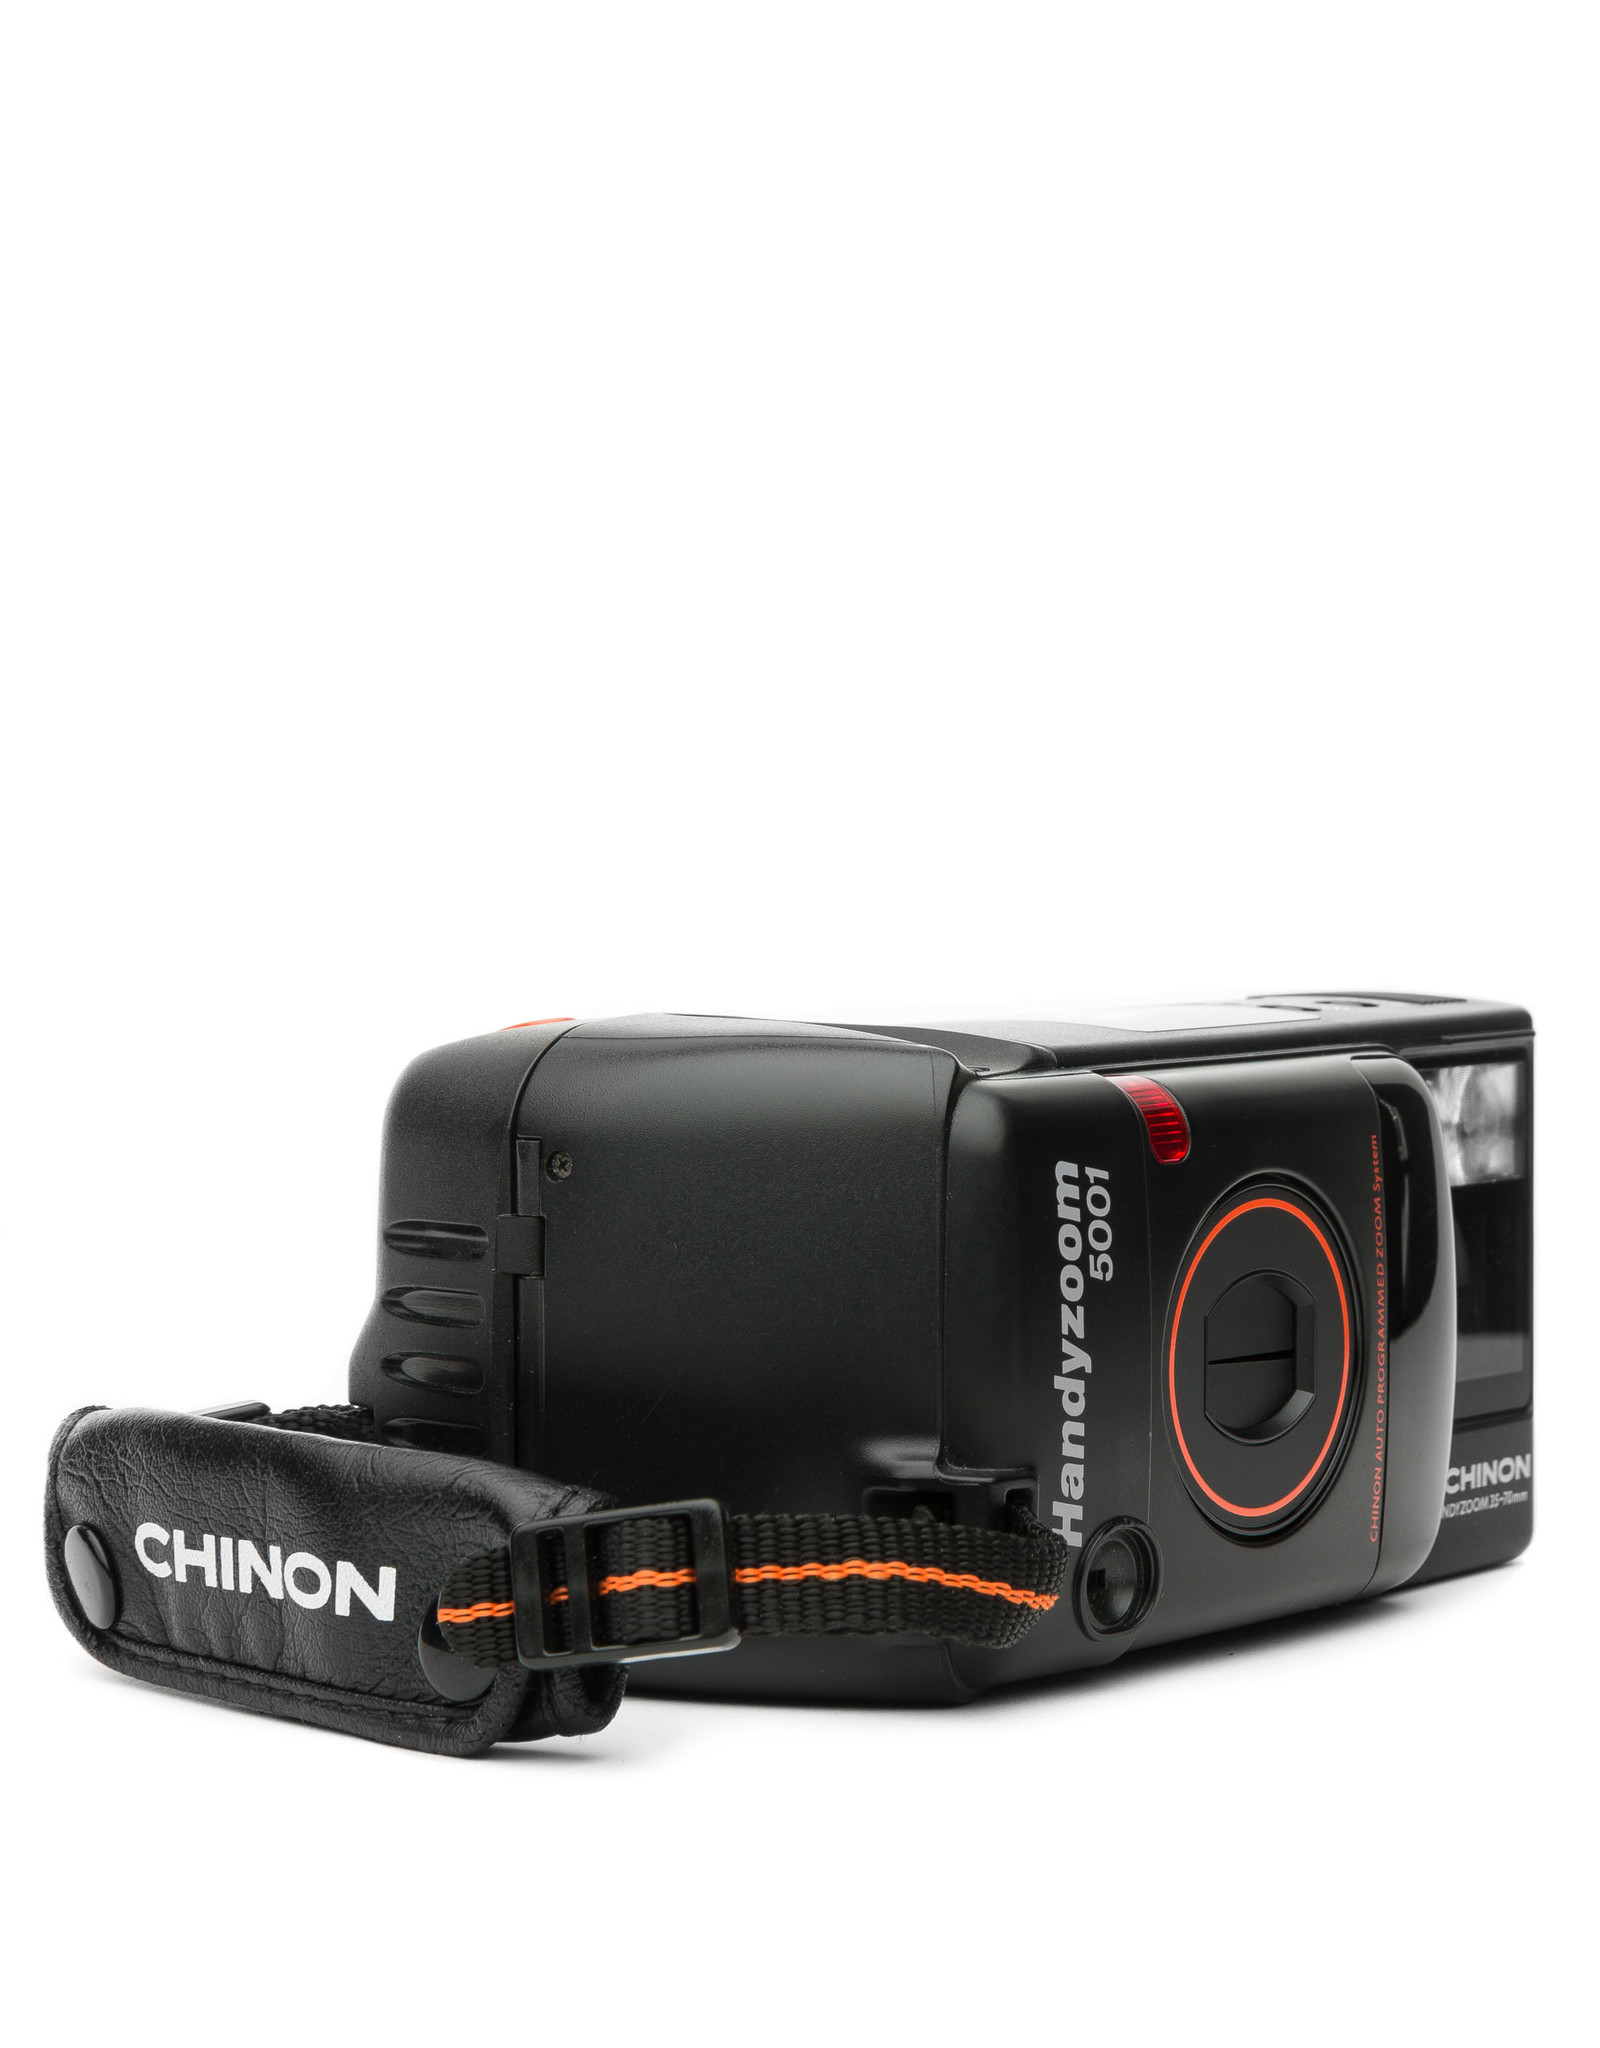 Chinon Chinon Handy Zoom 501 Compact CAMERA